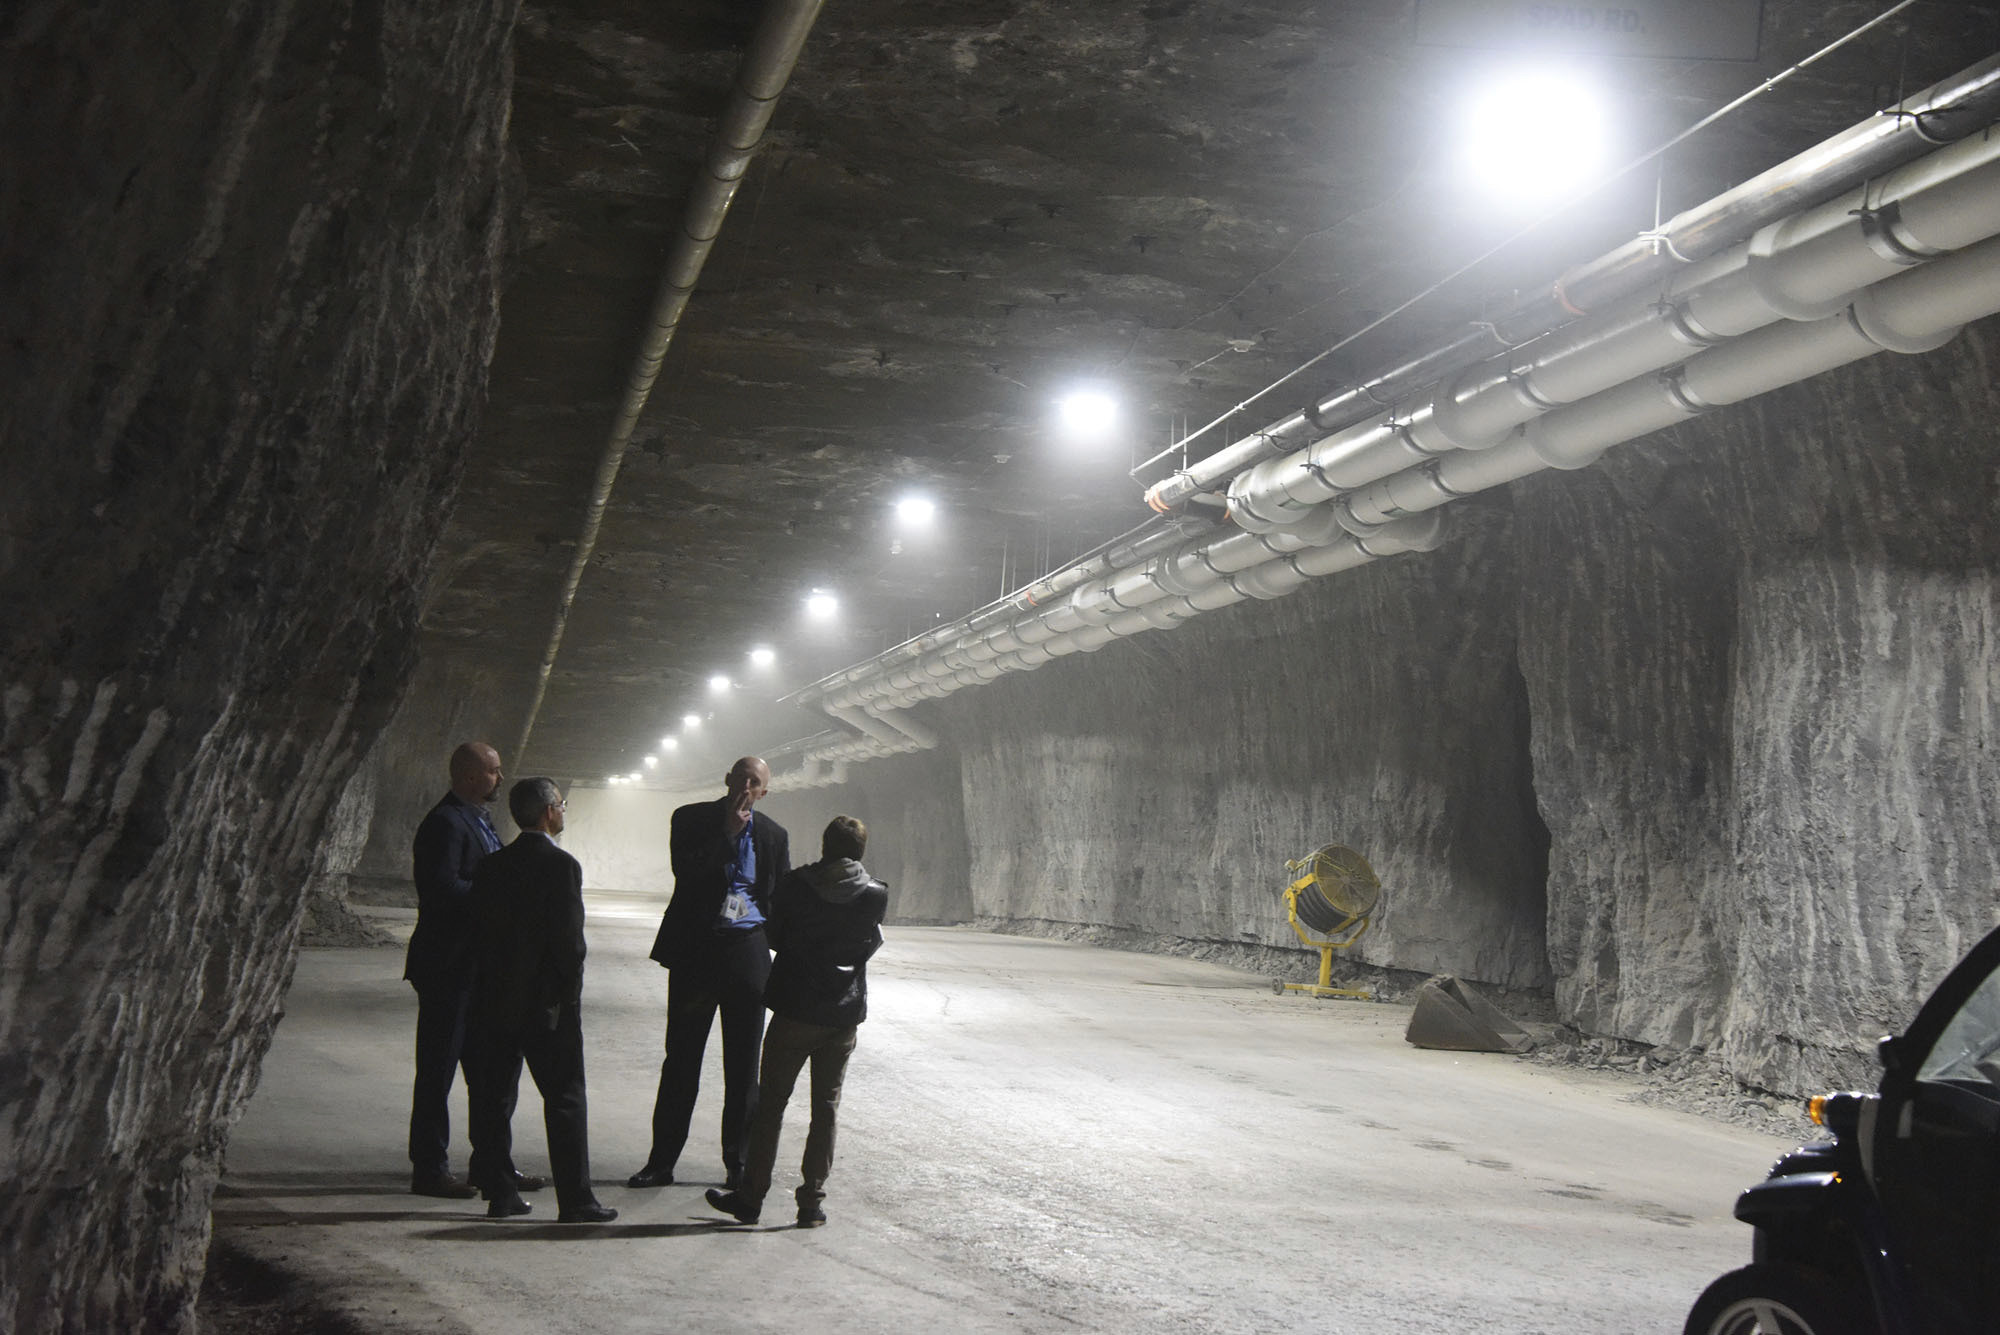 Iron Mountain's Pennsylvania mine expands to hold data ...